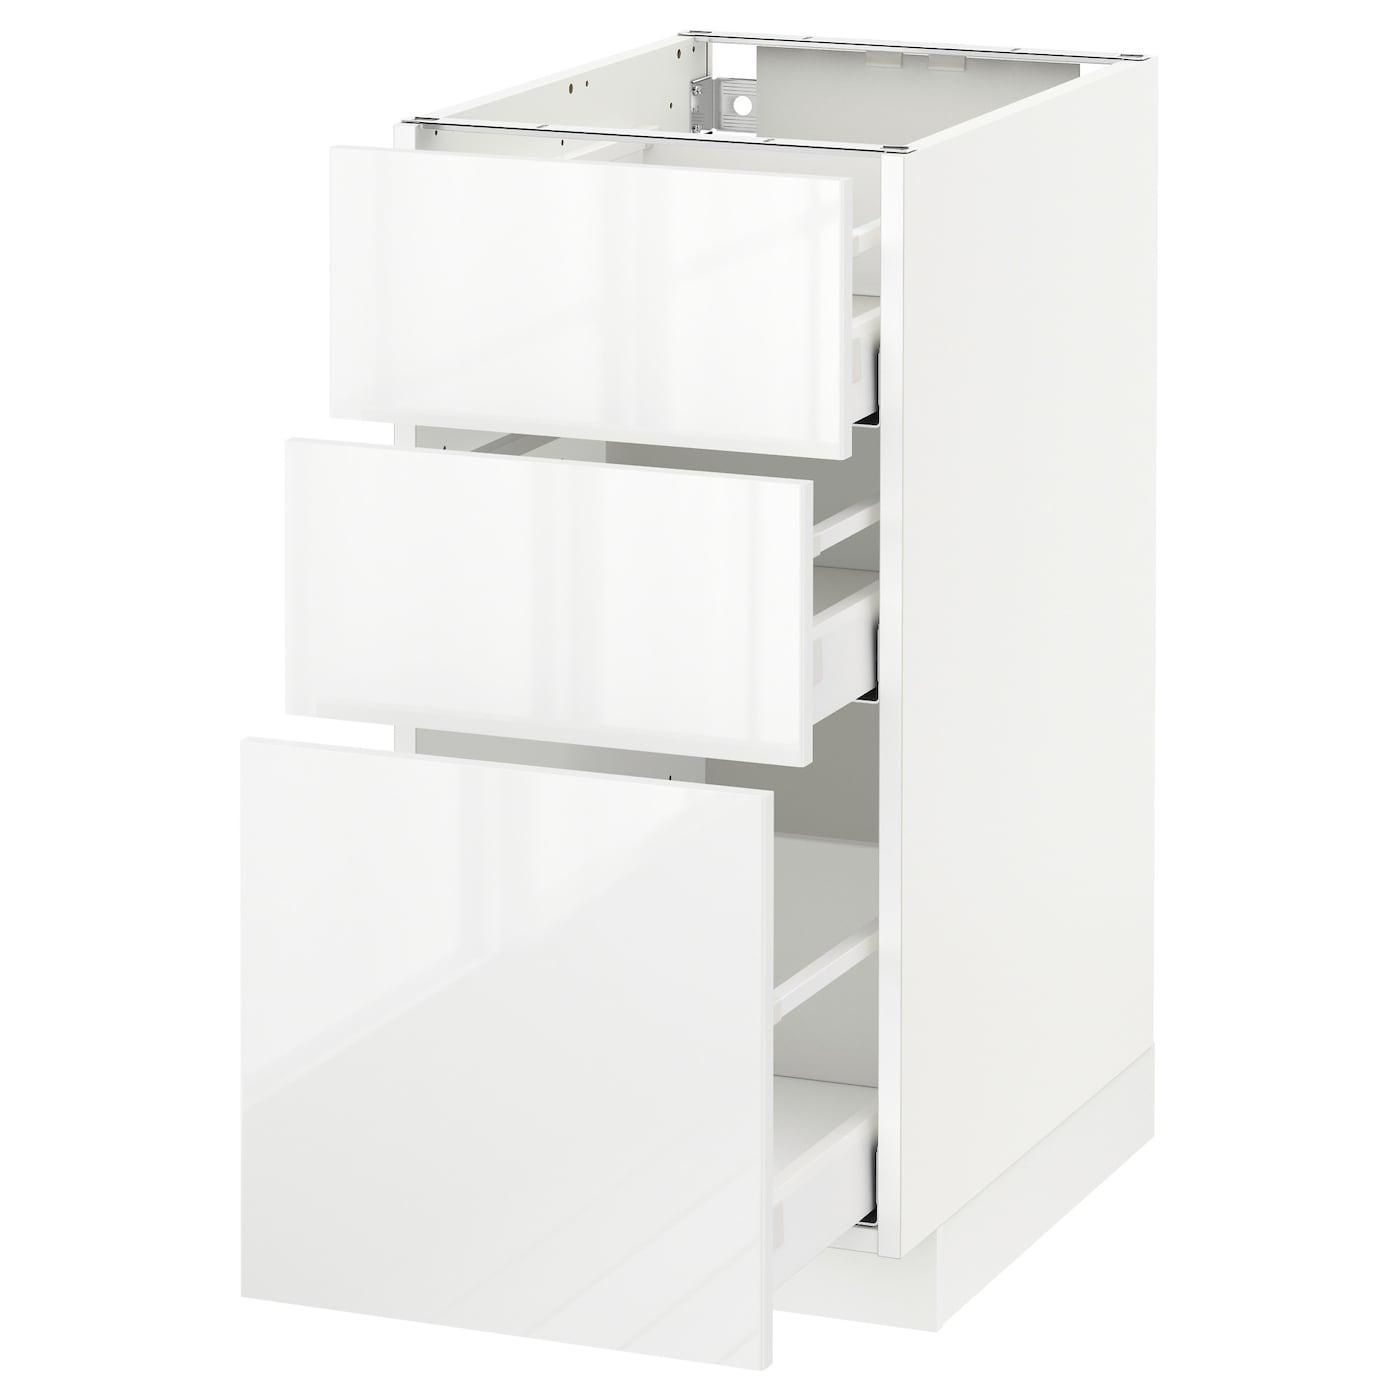 Metod Maximera Onderkast Met 3 Lades Wit Ringhult Wit 40x60 Cm Ikea